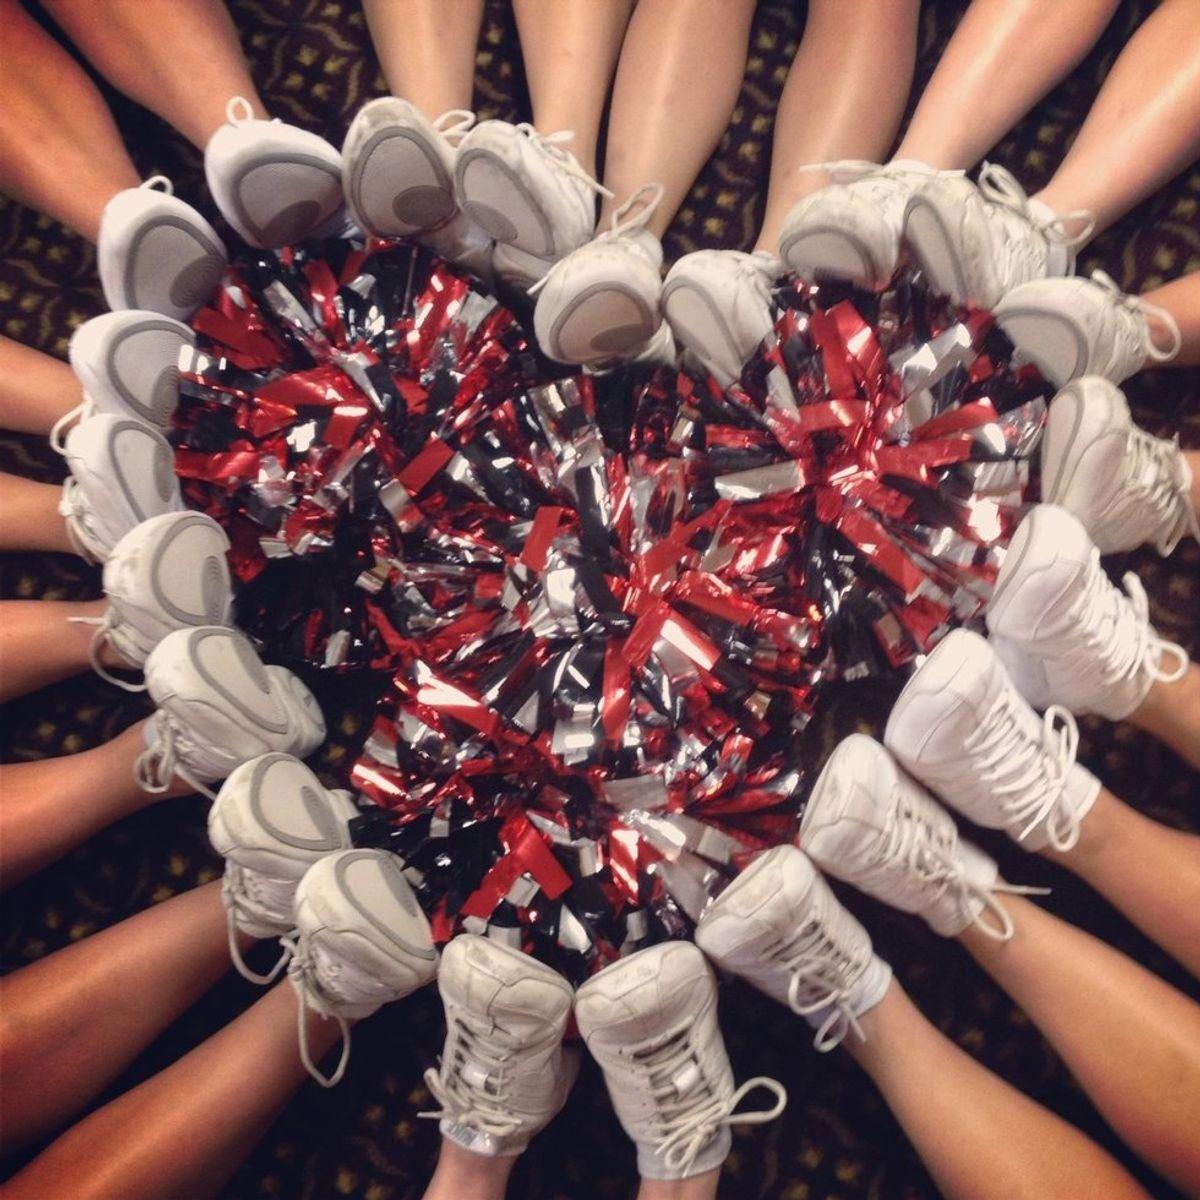 How Cheerleading Made Me Confident